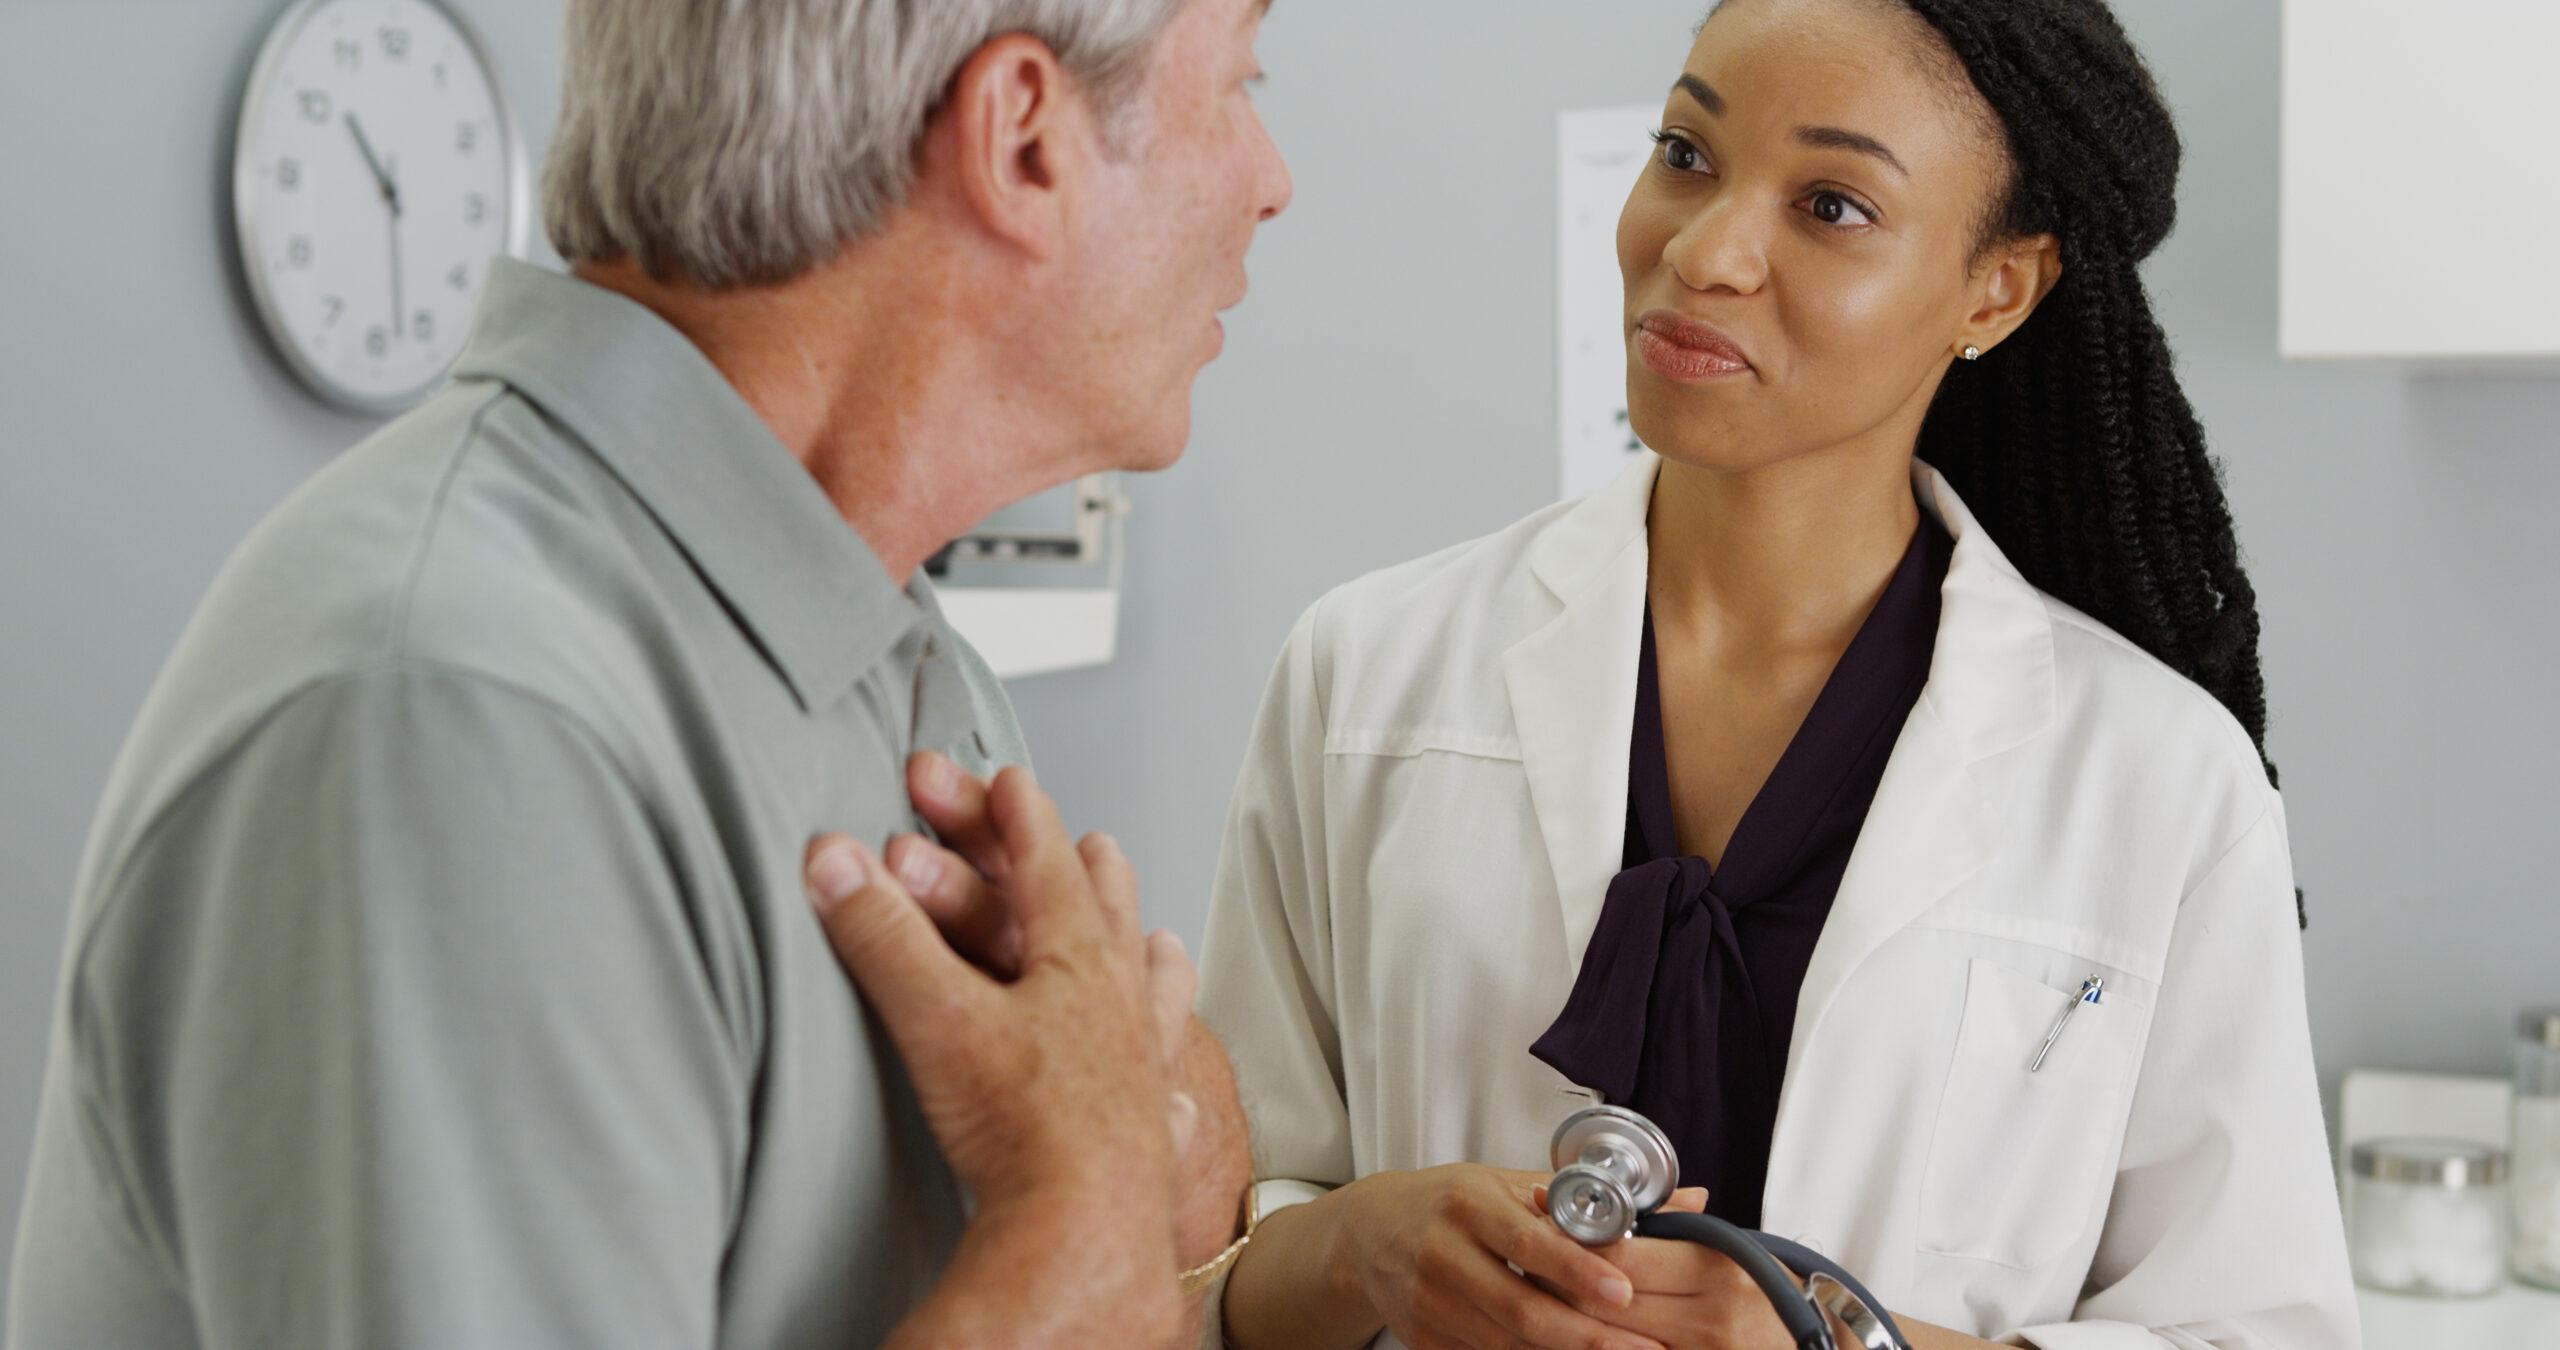 Black female doctor using excellent communications skills talking with older male patient | Vanguard Communications | Denver, Knoxville, TN, Jacksonville, FL